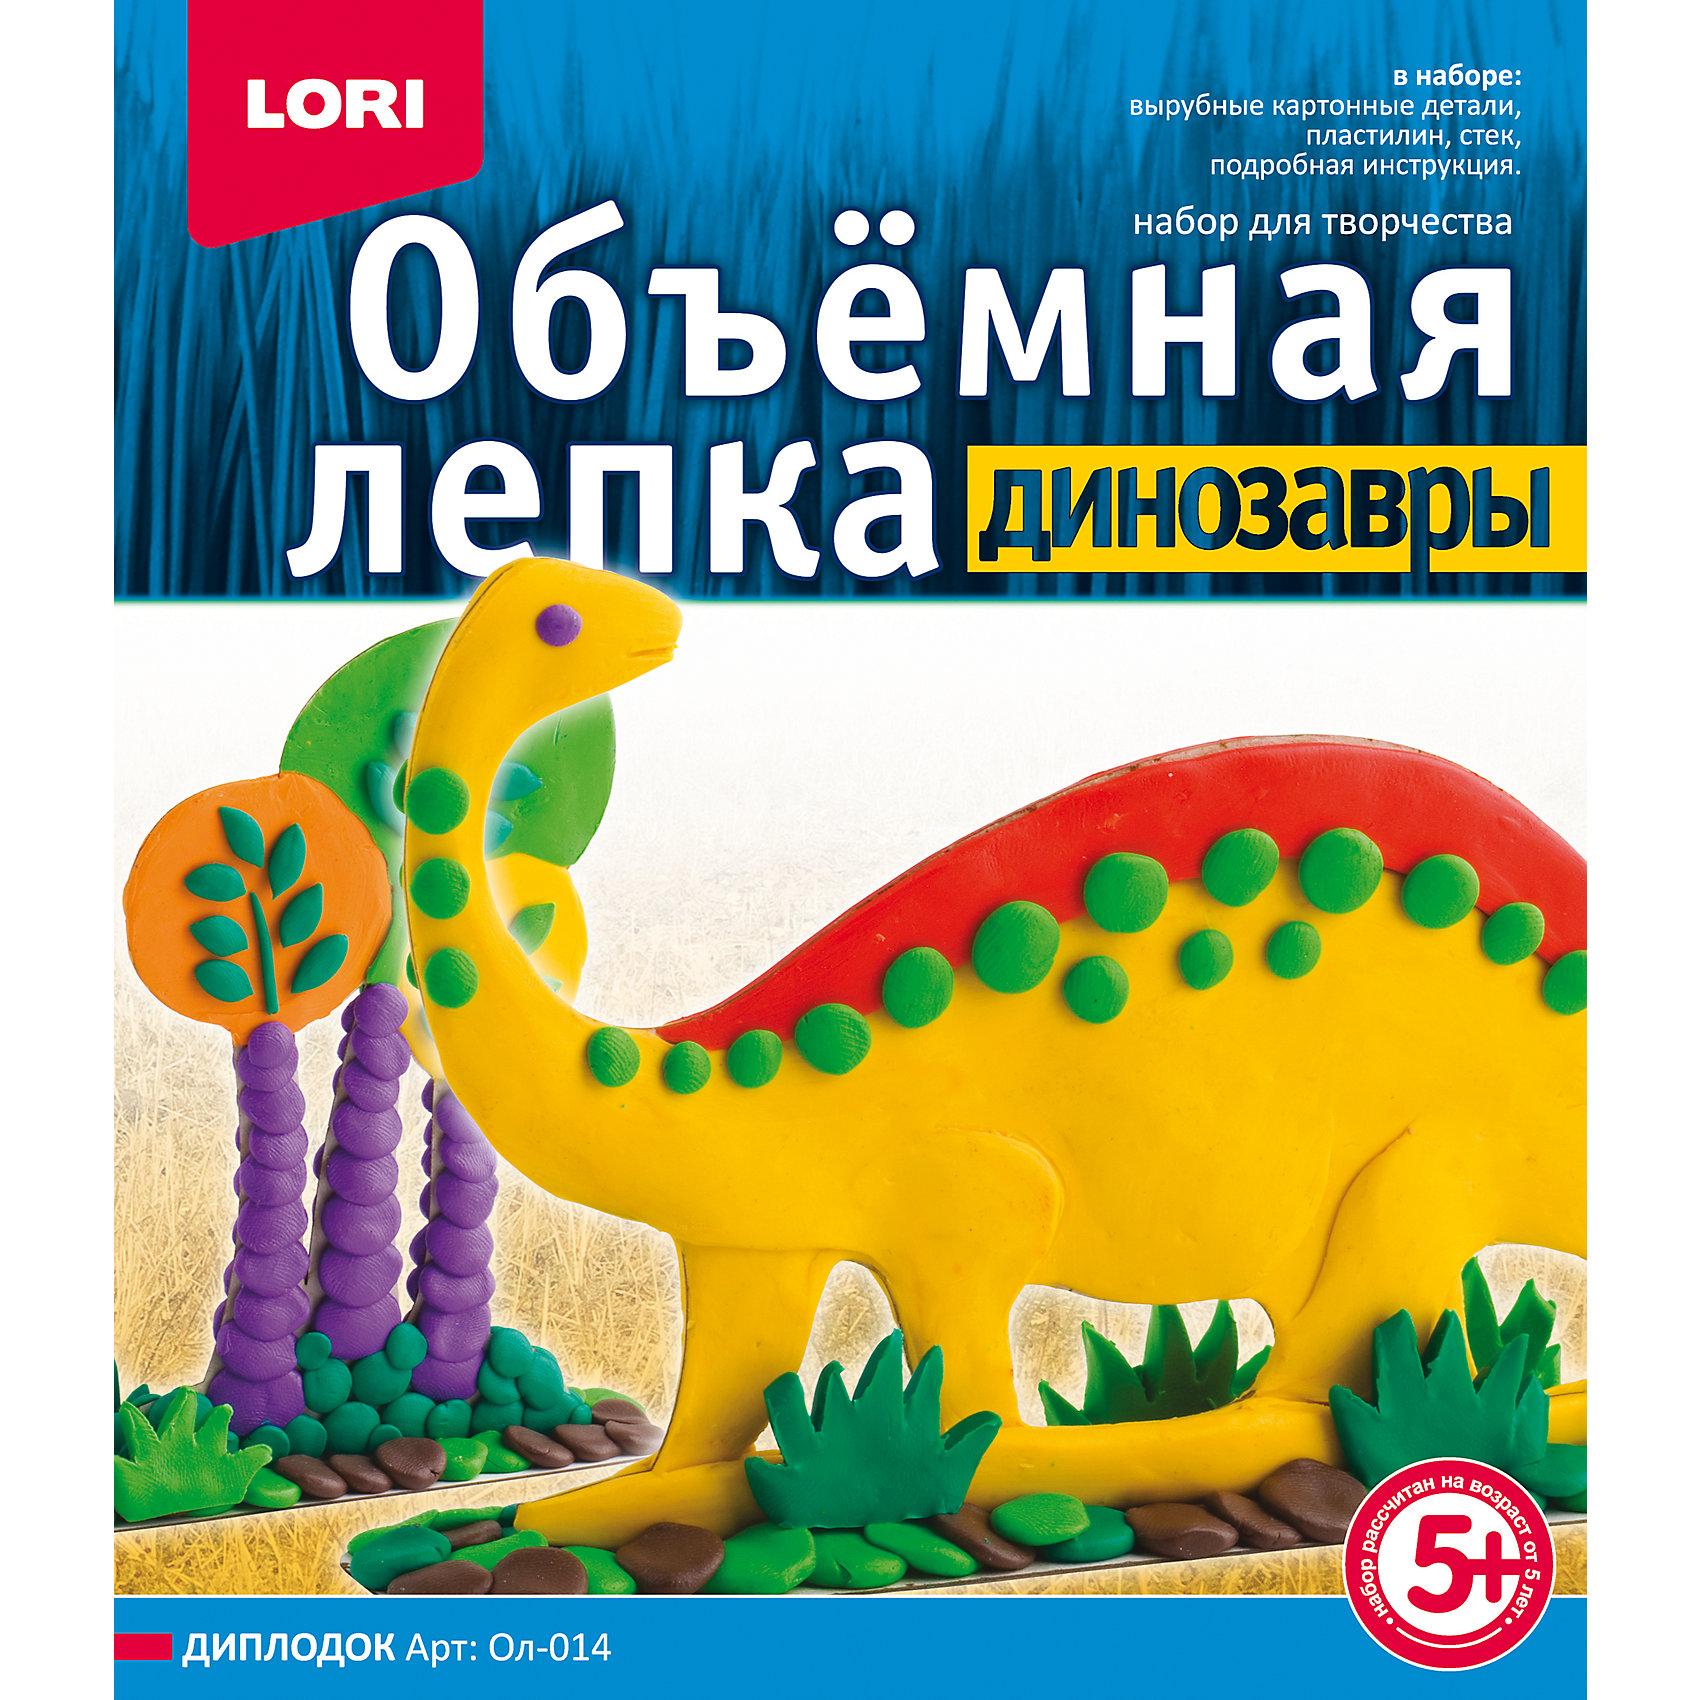 LORI Лепка объемная, Динозавры Диплодок lori пластилин тачки 16 цветов